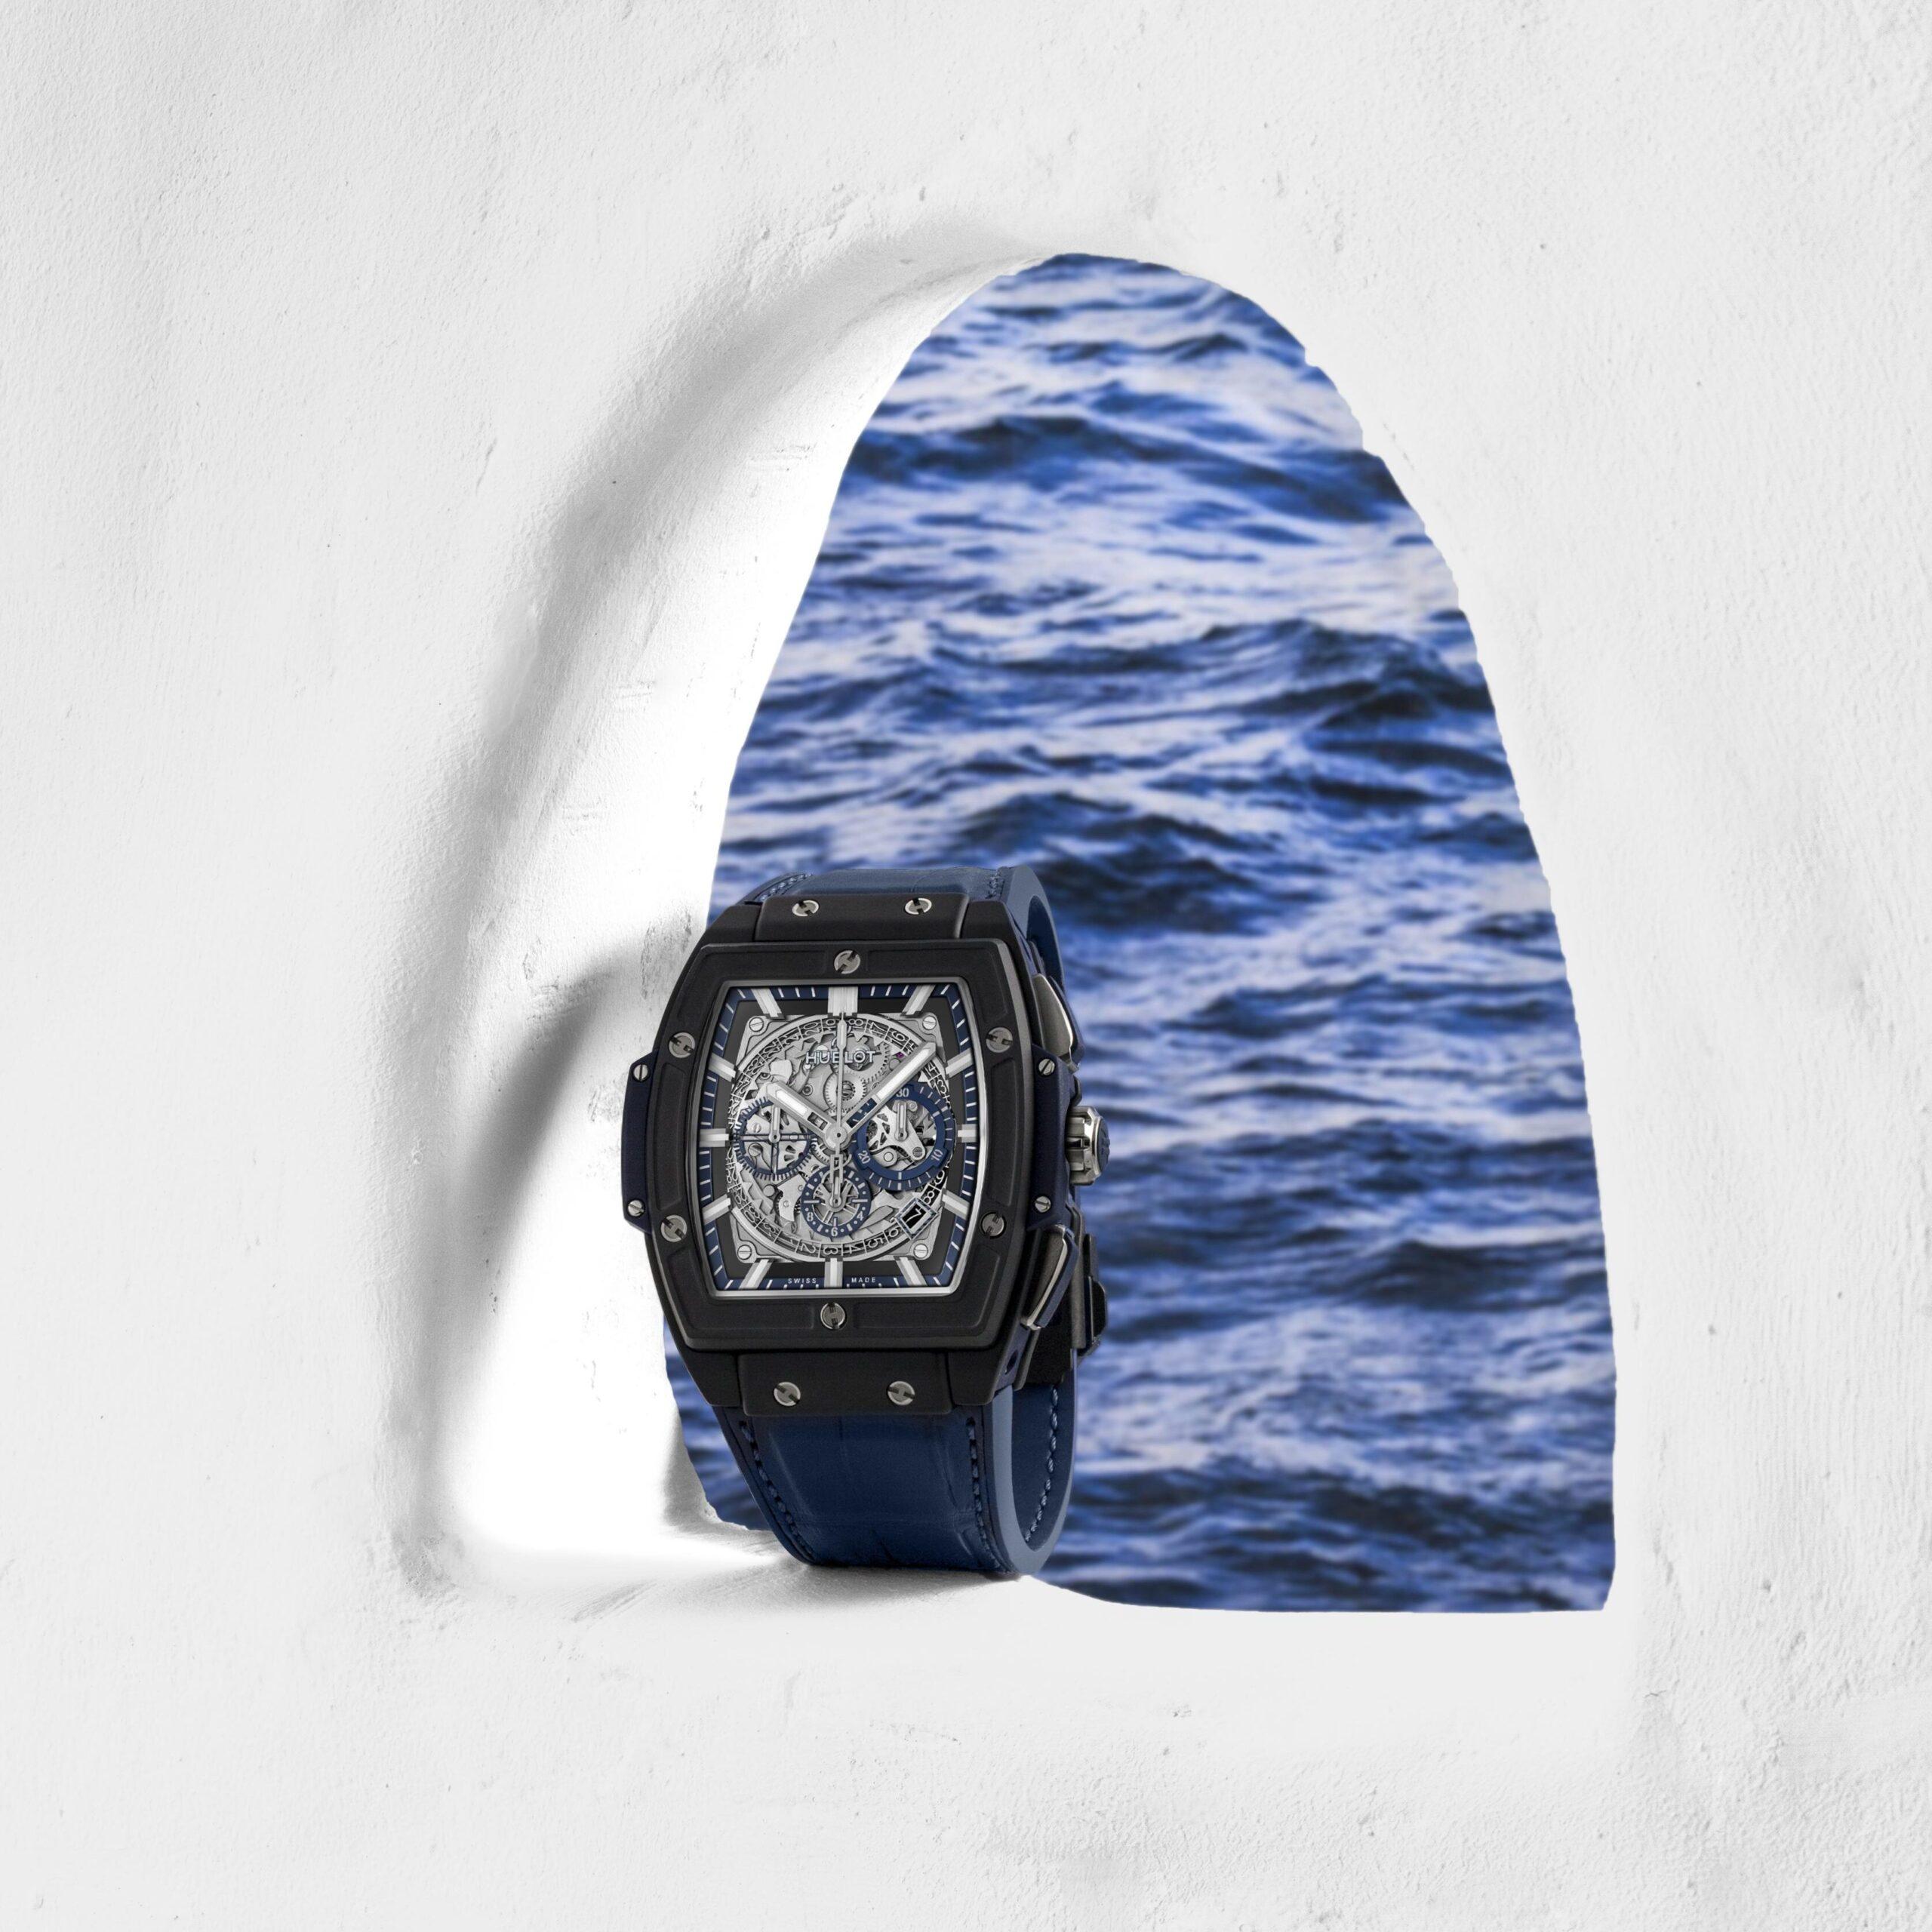 Sprit of Big Bang Hublot Mezger Uhren und Juwelen Basel